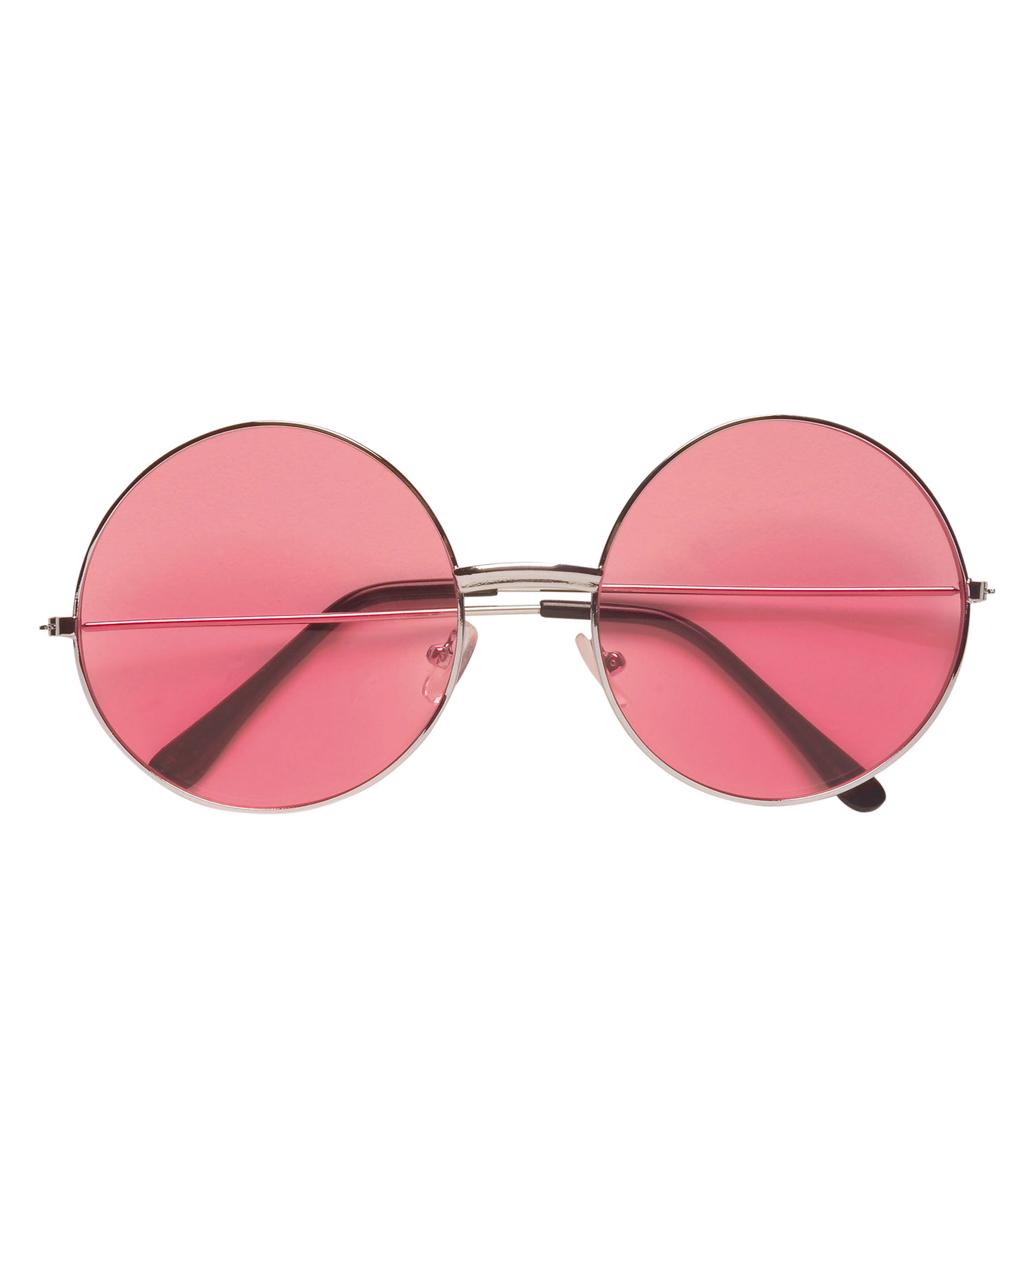 a9949933ea Hot 70s Sunglasses